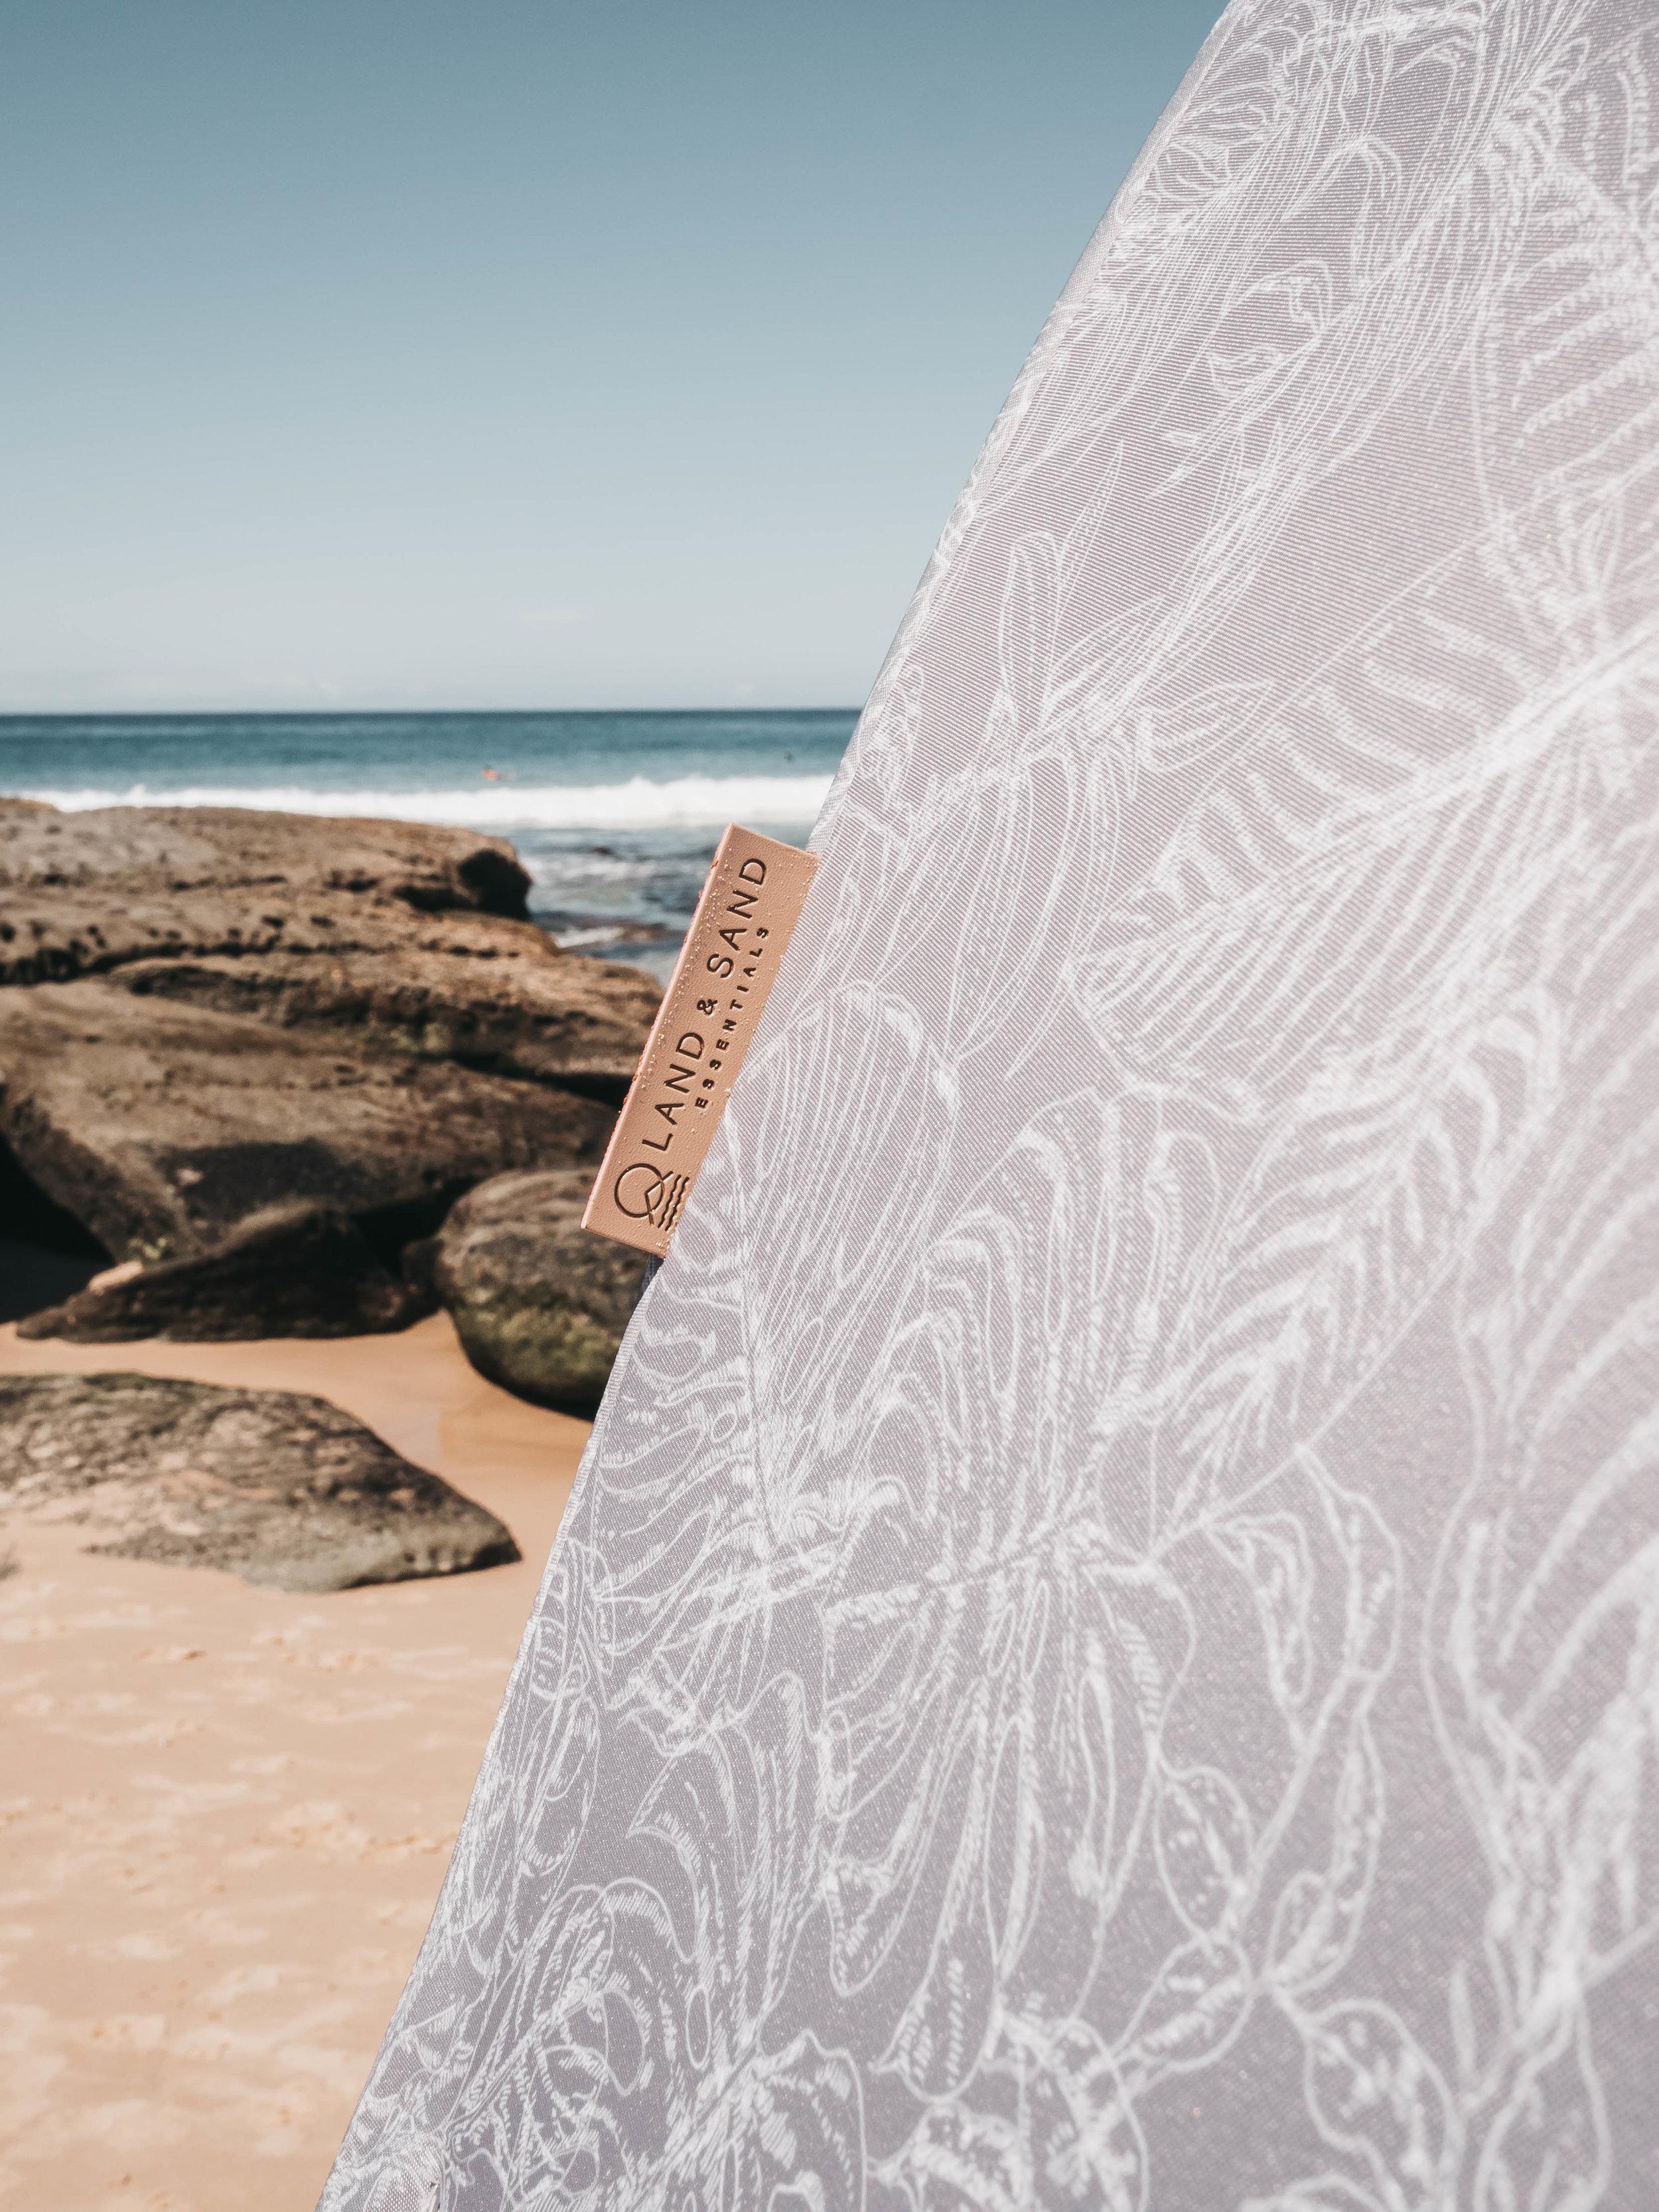 BrookeArtStudio_Land&Sand-77 copy.jpg